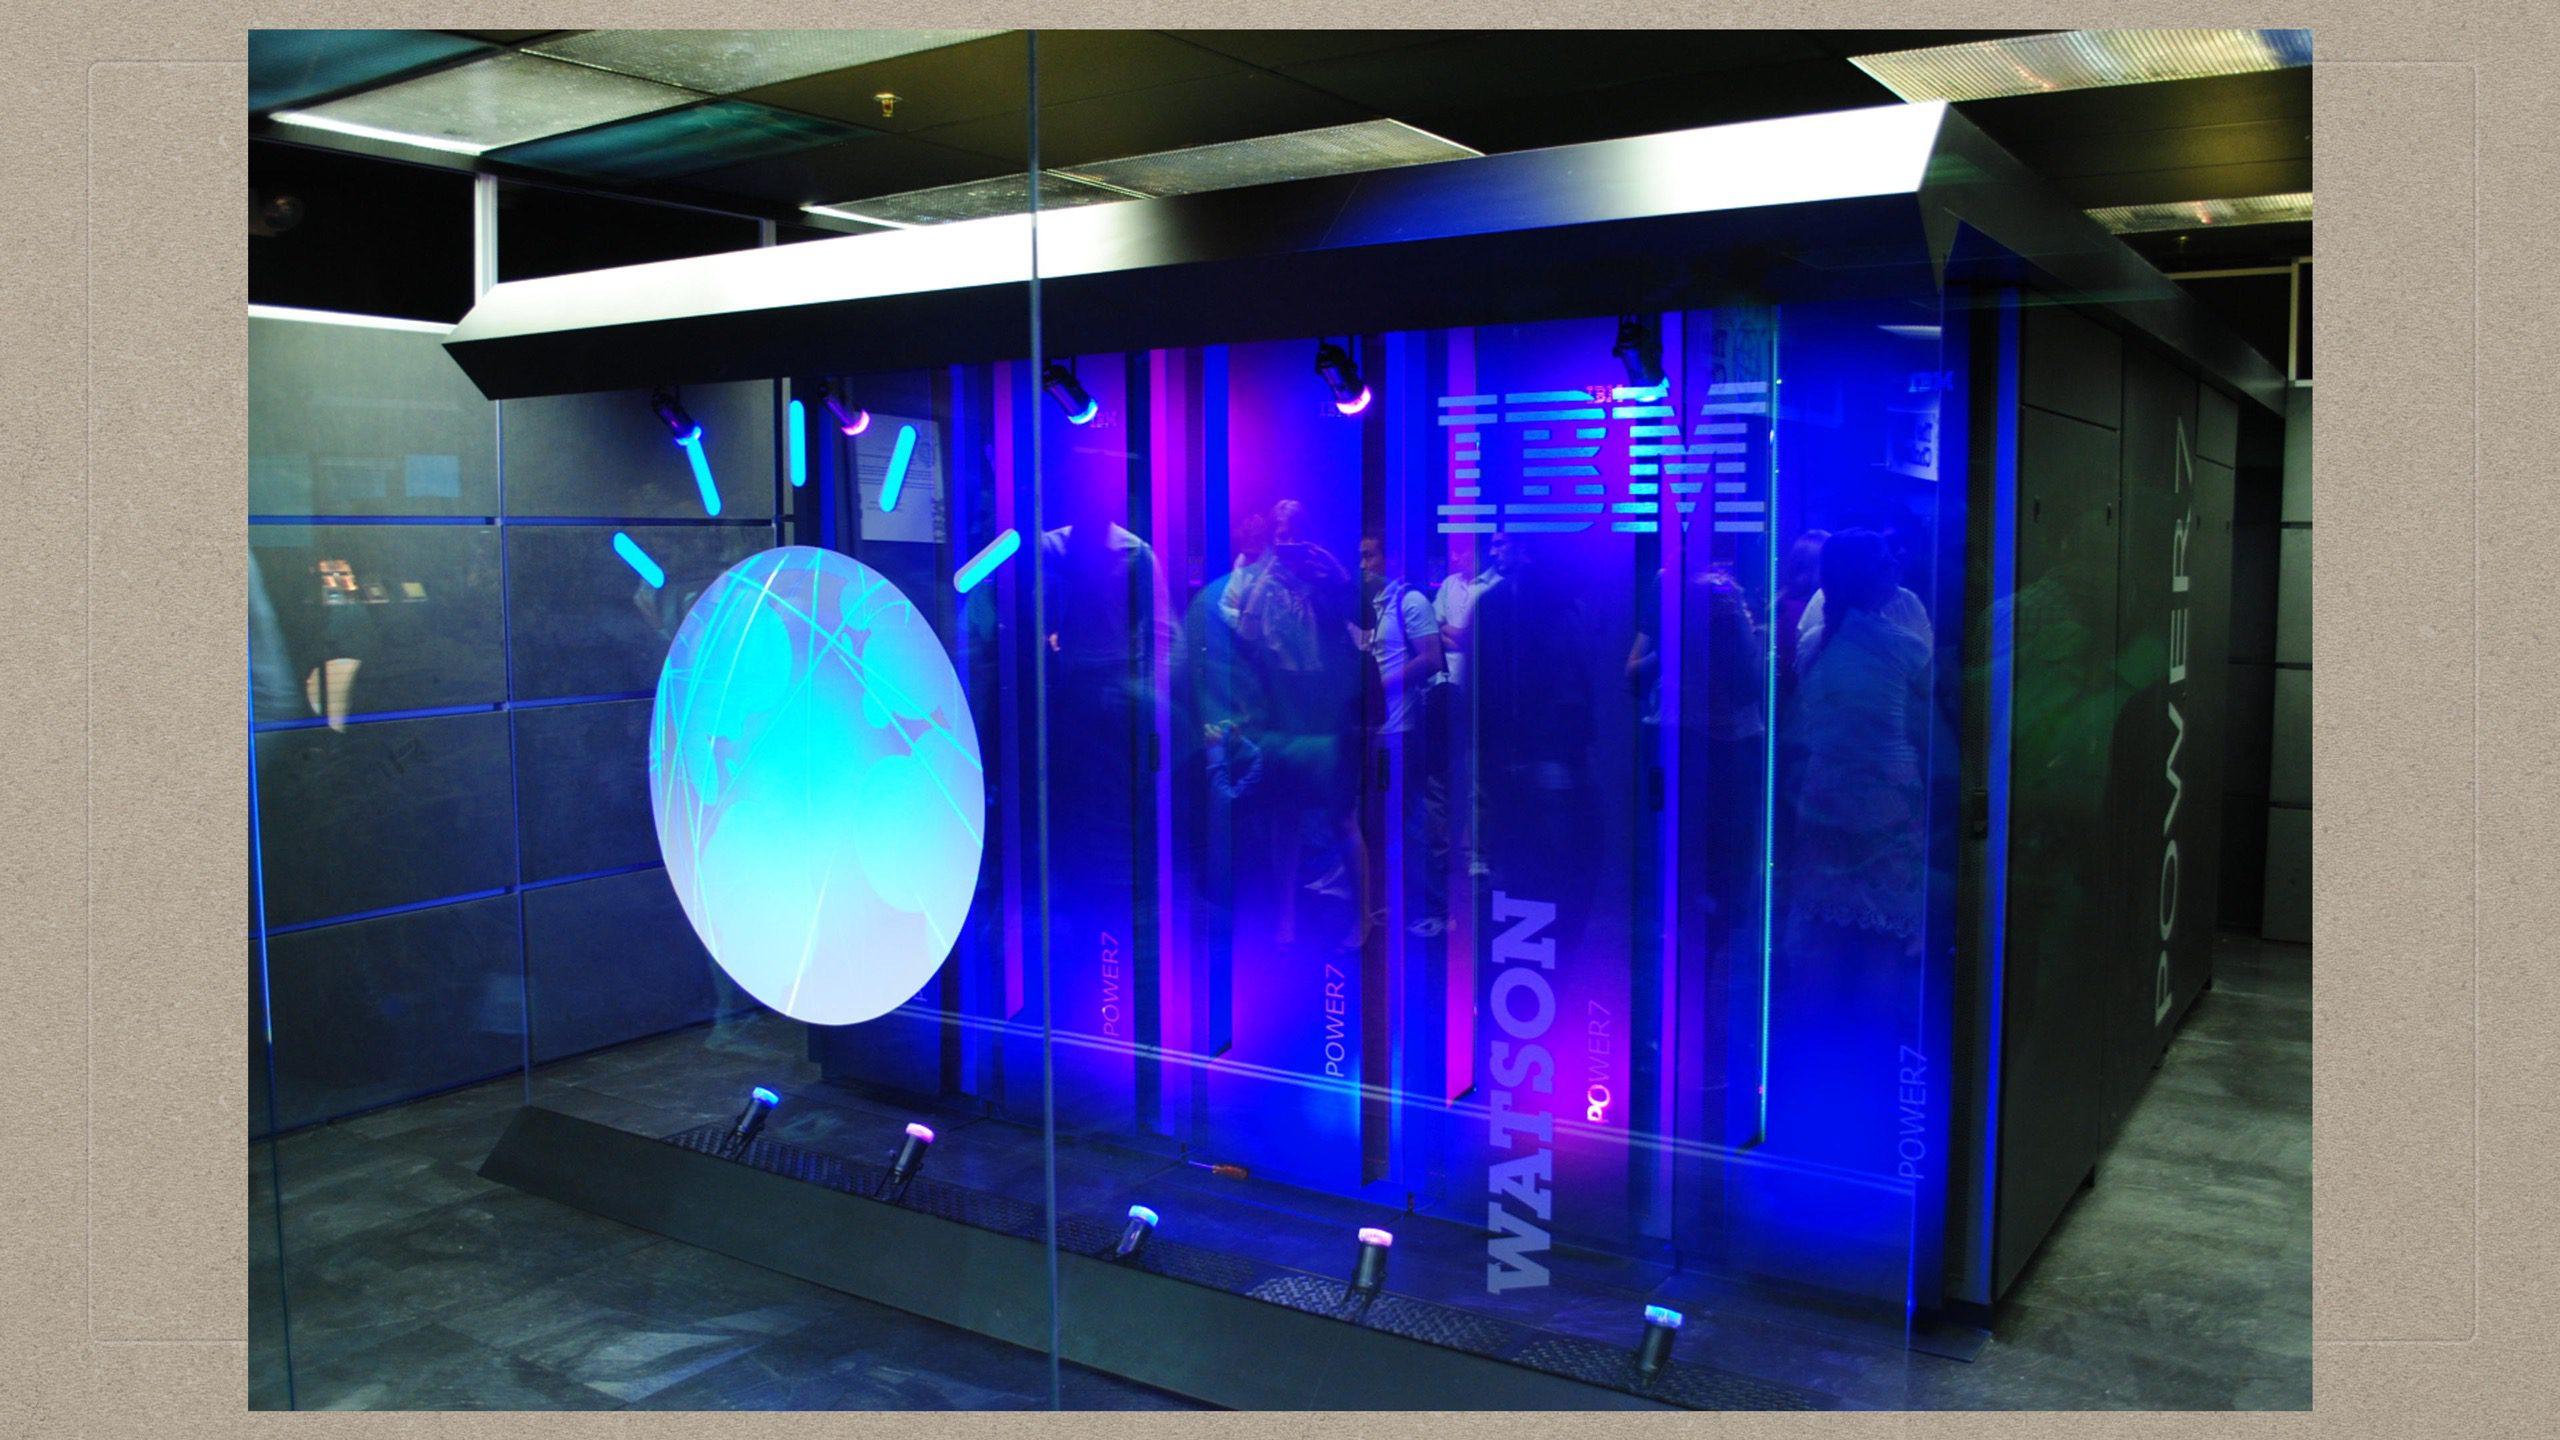 03-04-IBM Watson